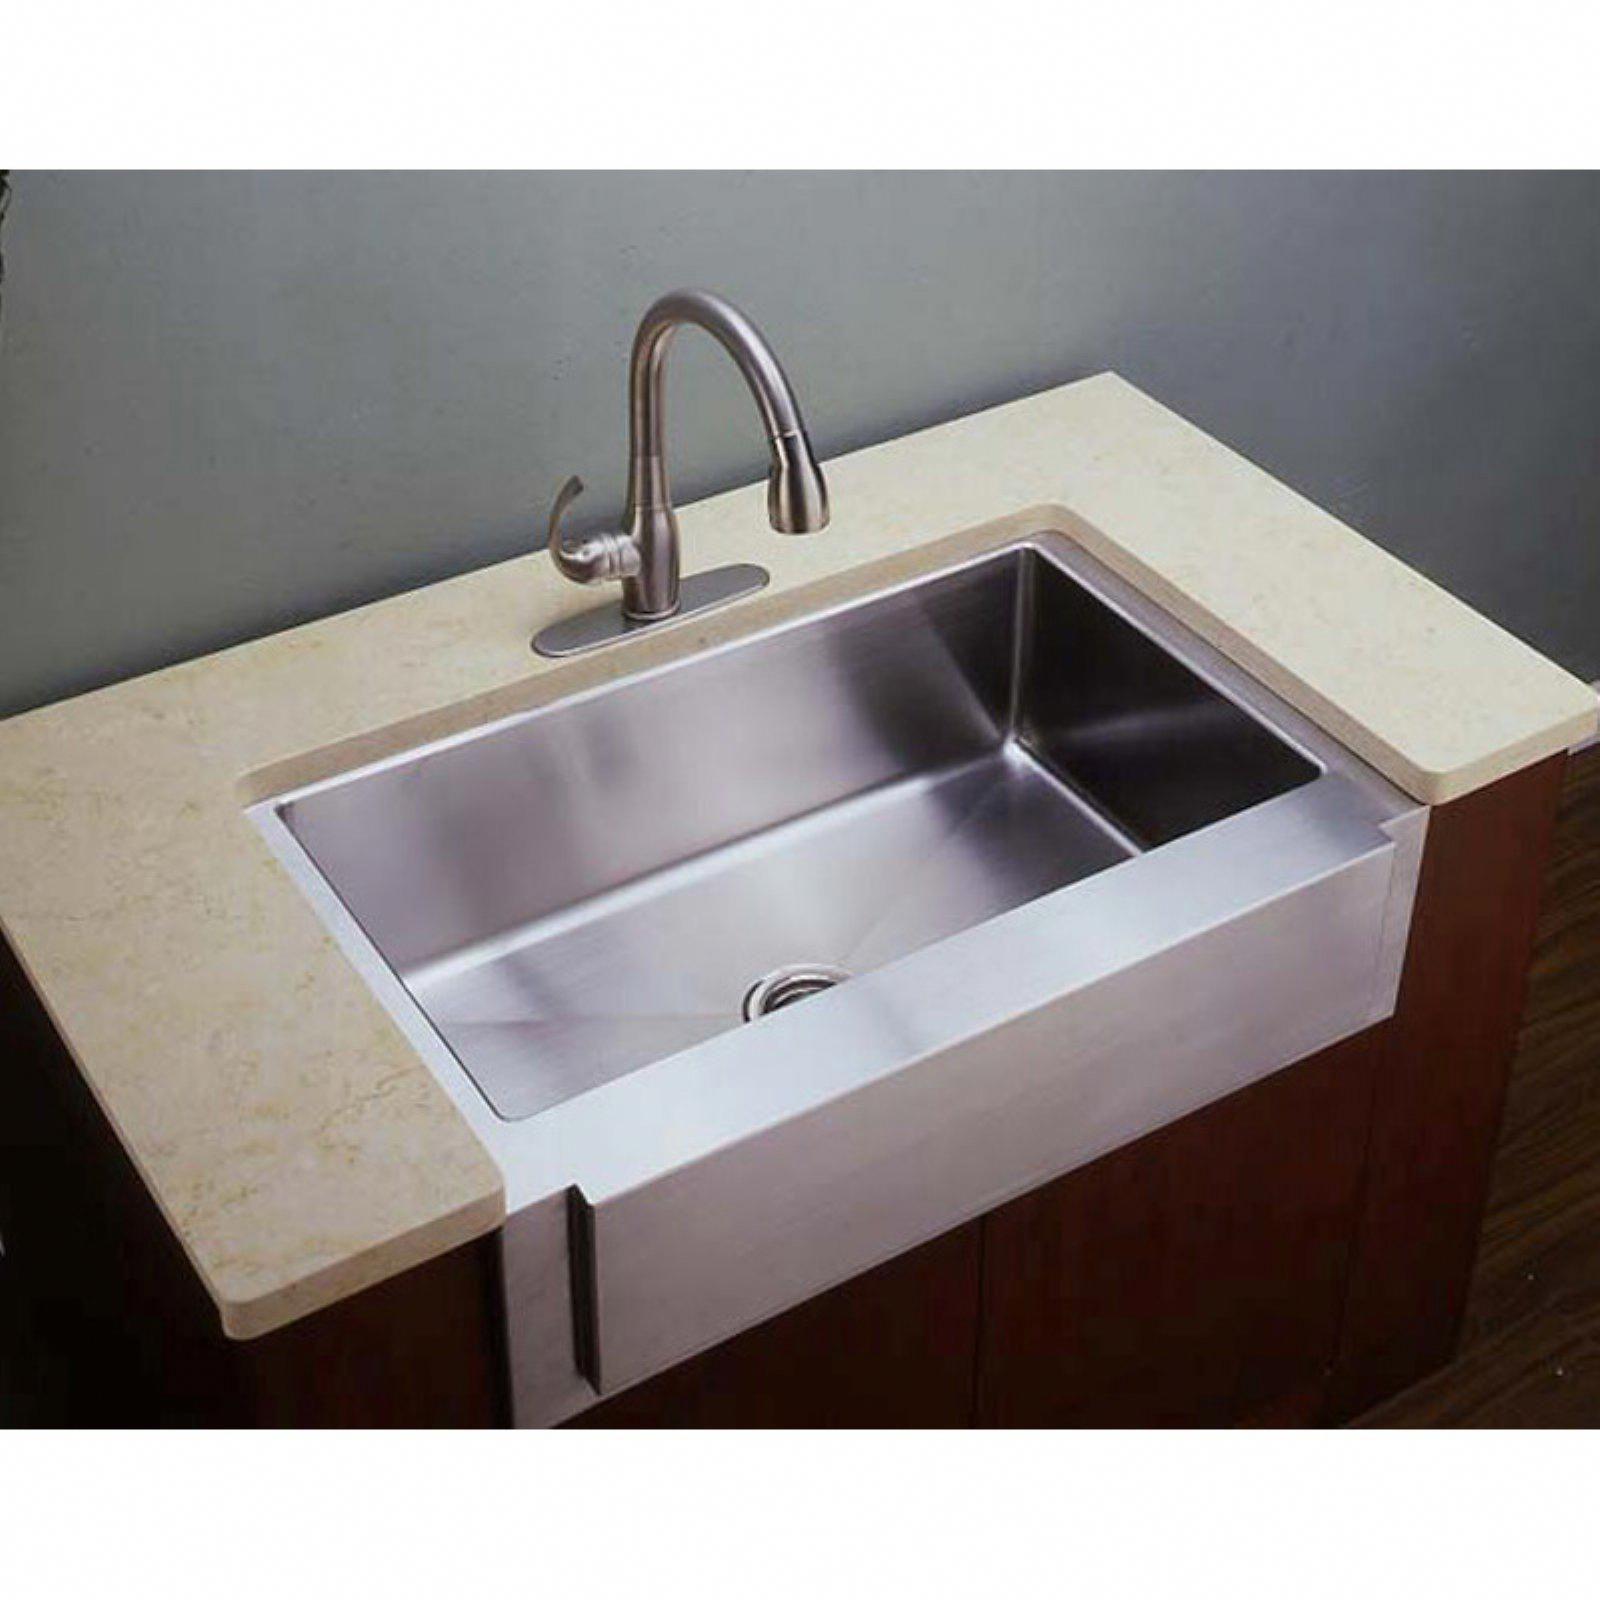 37+ Single bowl apron sink ideas